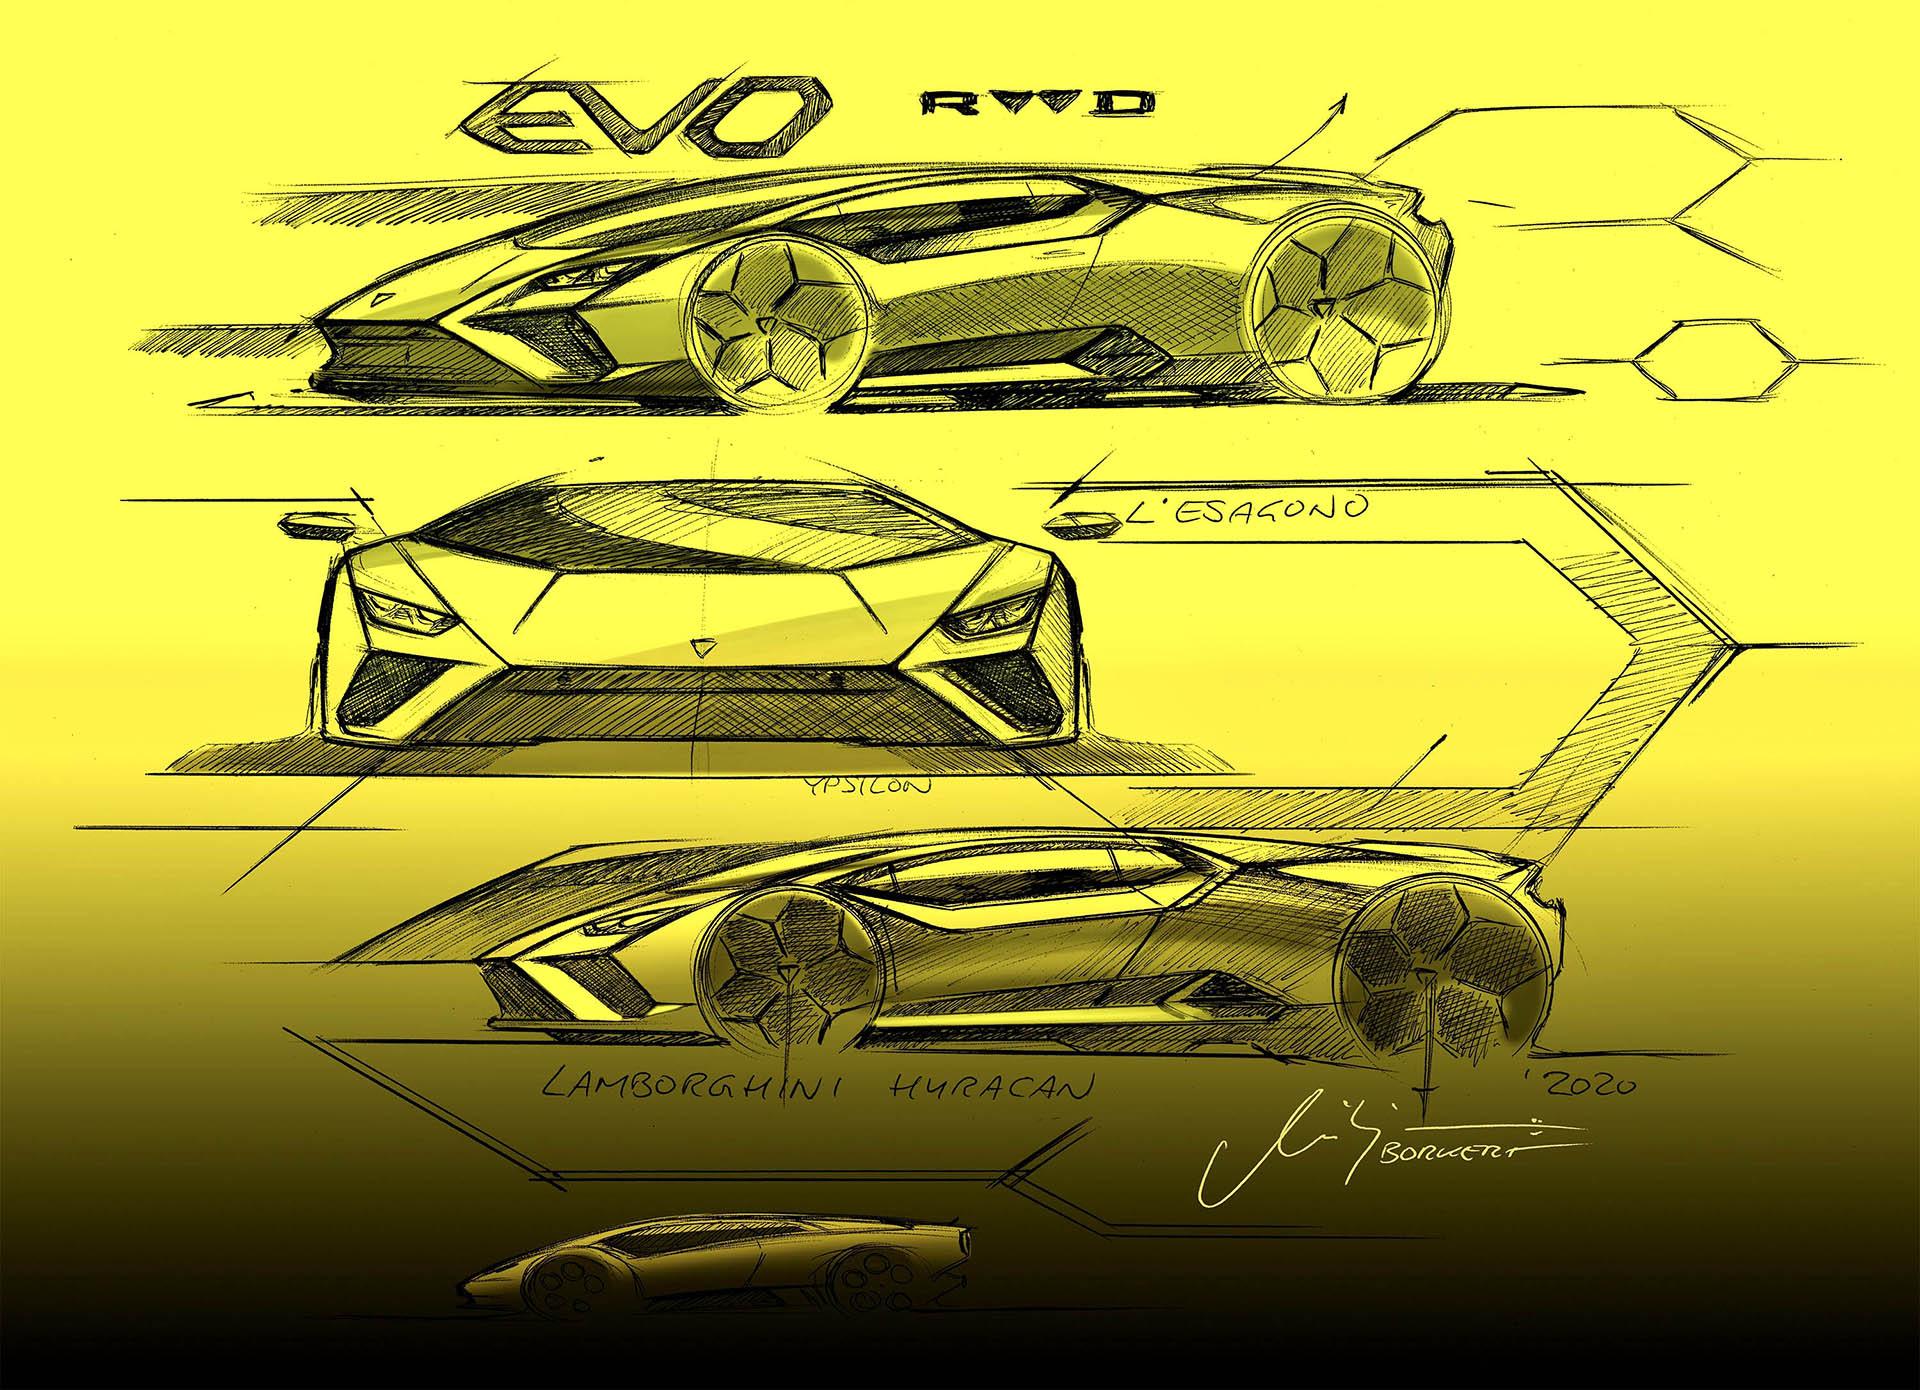 Geschiedenis van Lamborghini - Huracan design